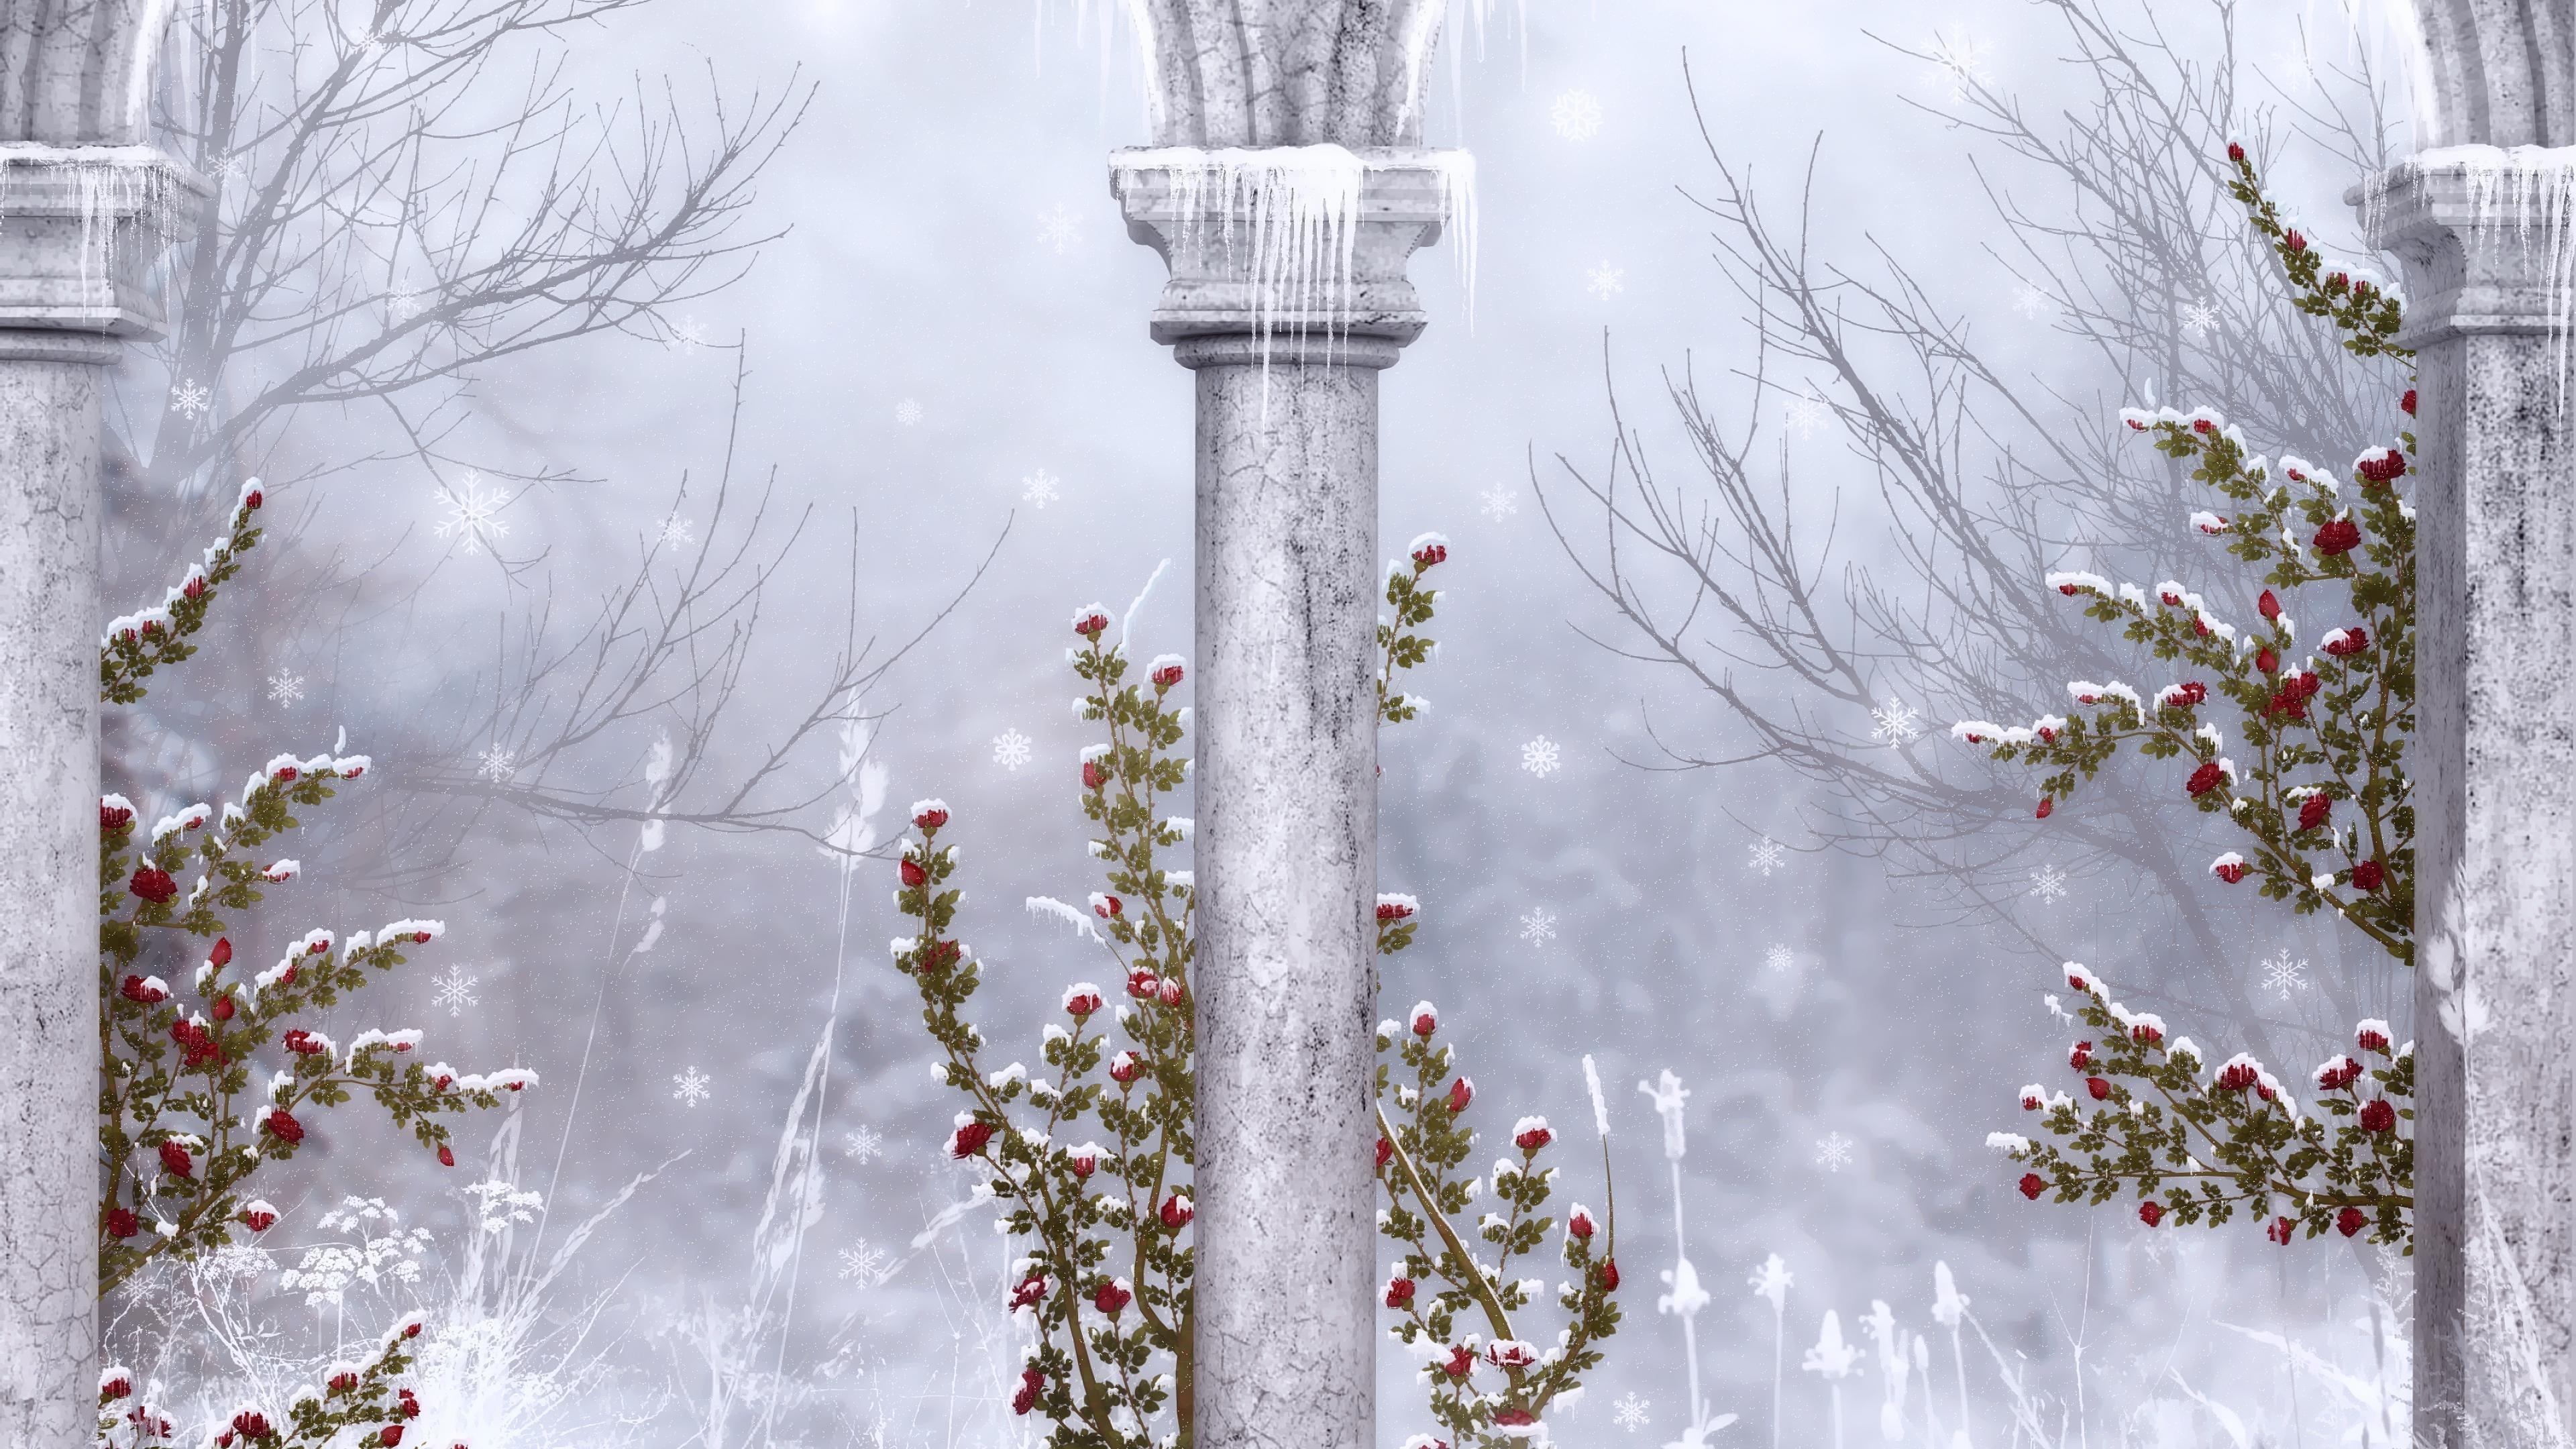 Winter Wallpapers 3840x2160 Ultra Hd 4k Desktop Backgrounds